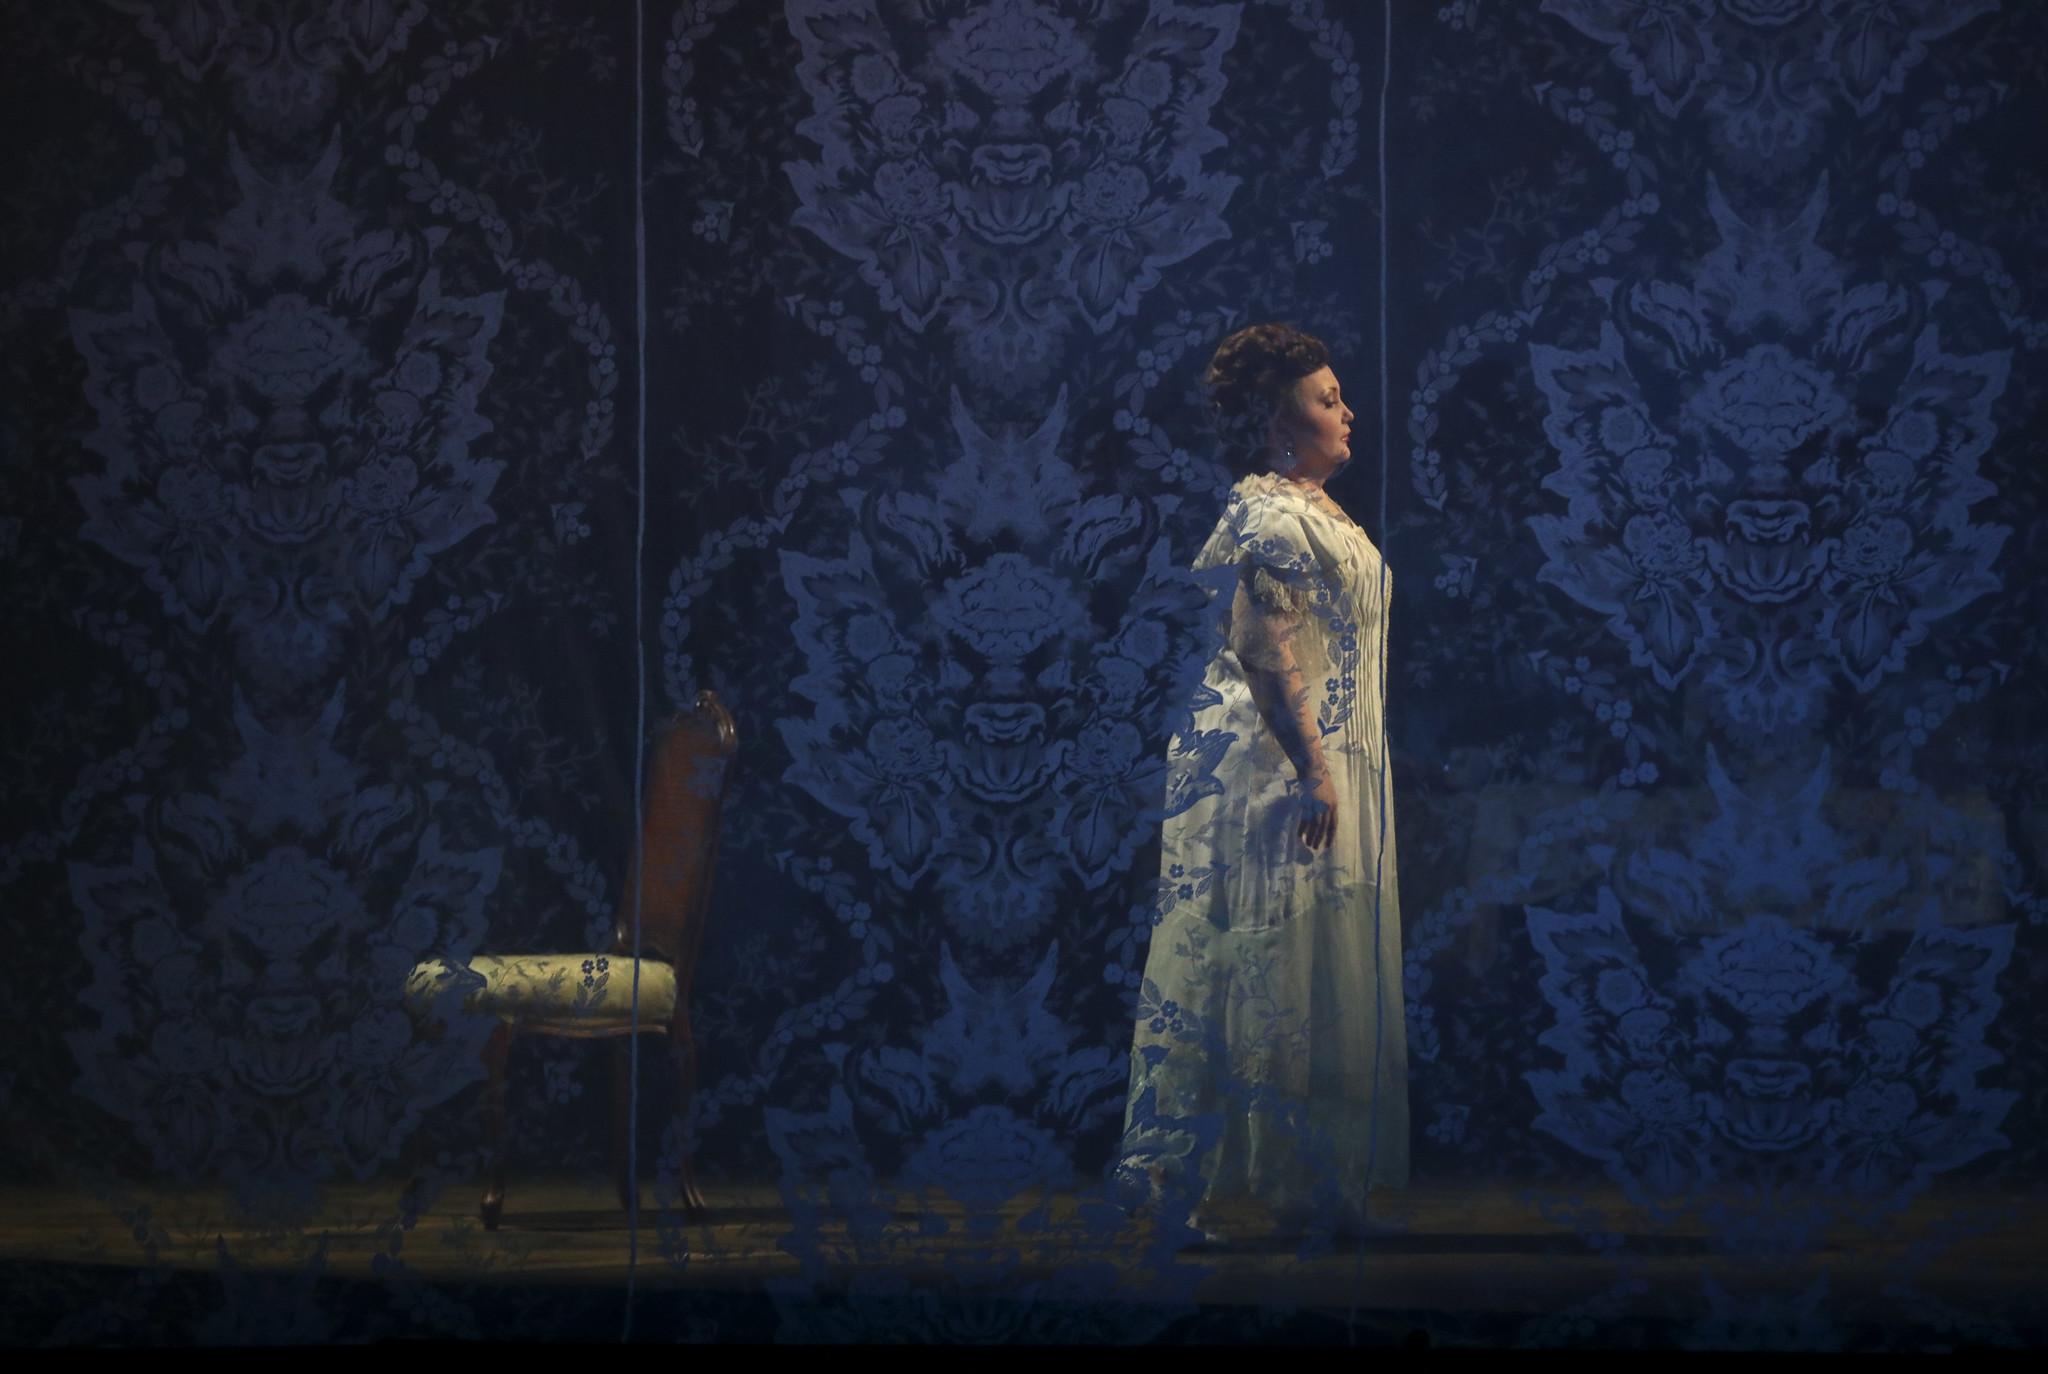 Lyric Opera review: One singer soars in Verdi's 'La Traviata'